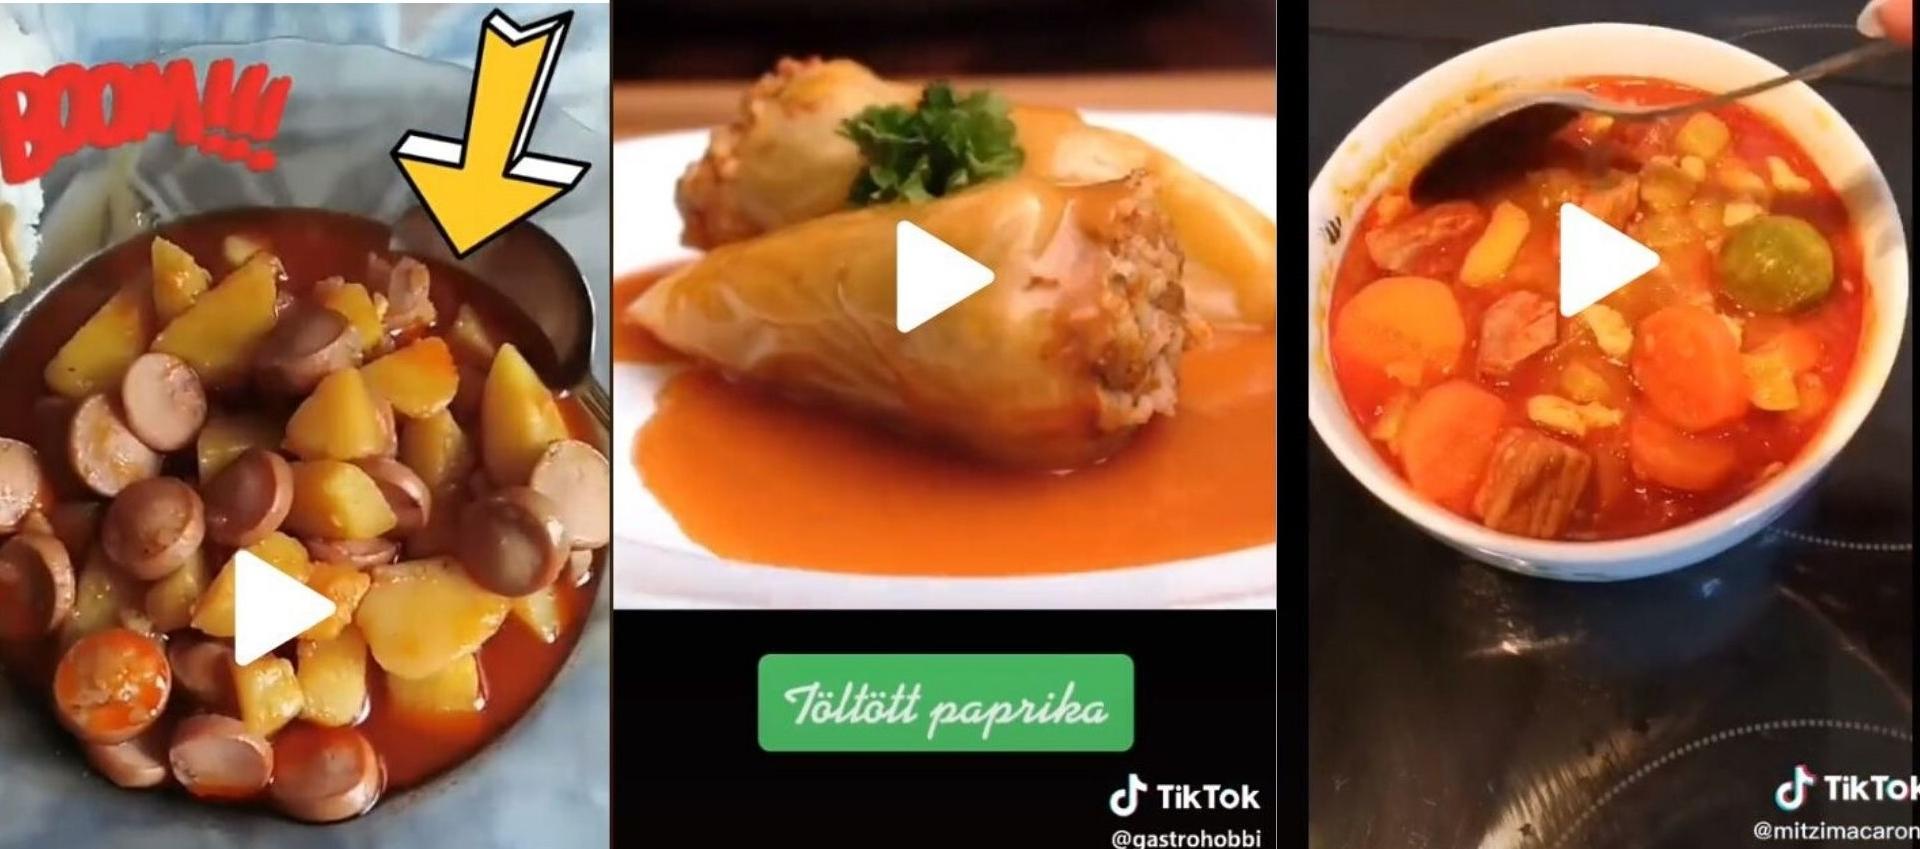 TikTok recipes